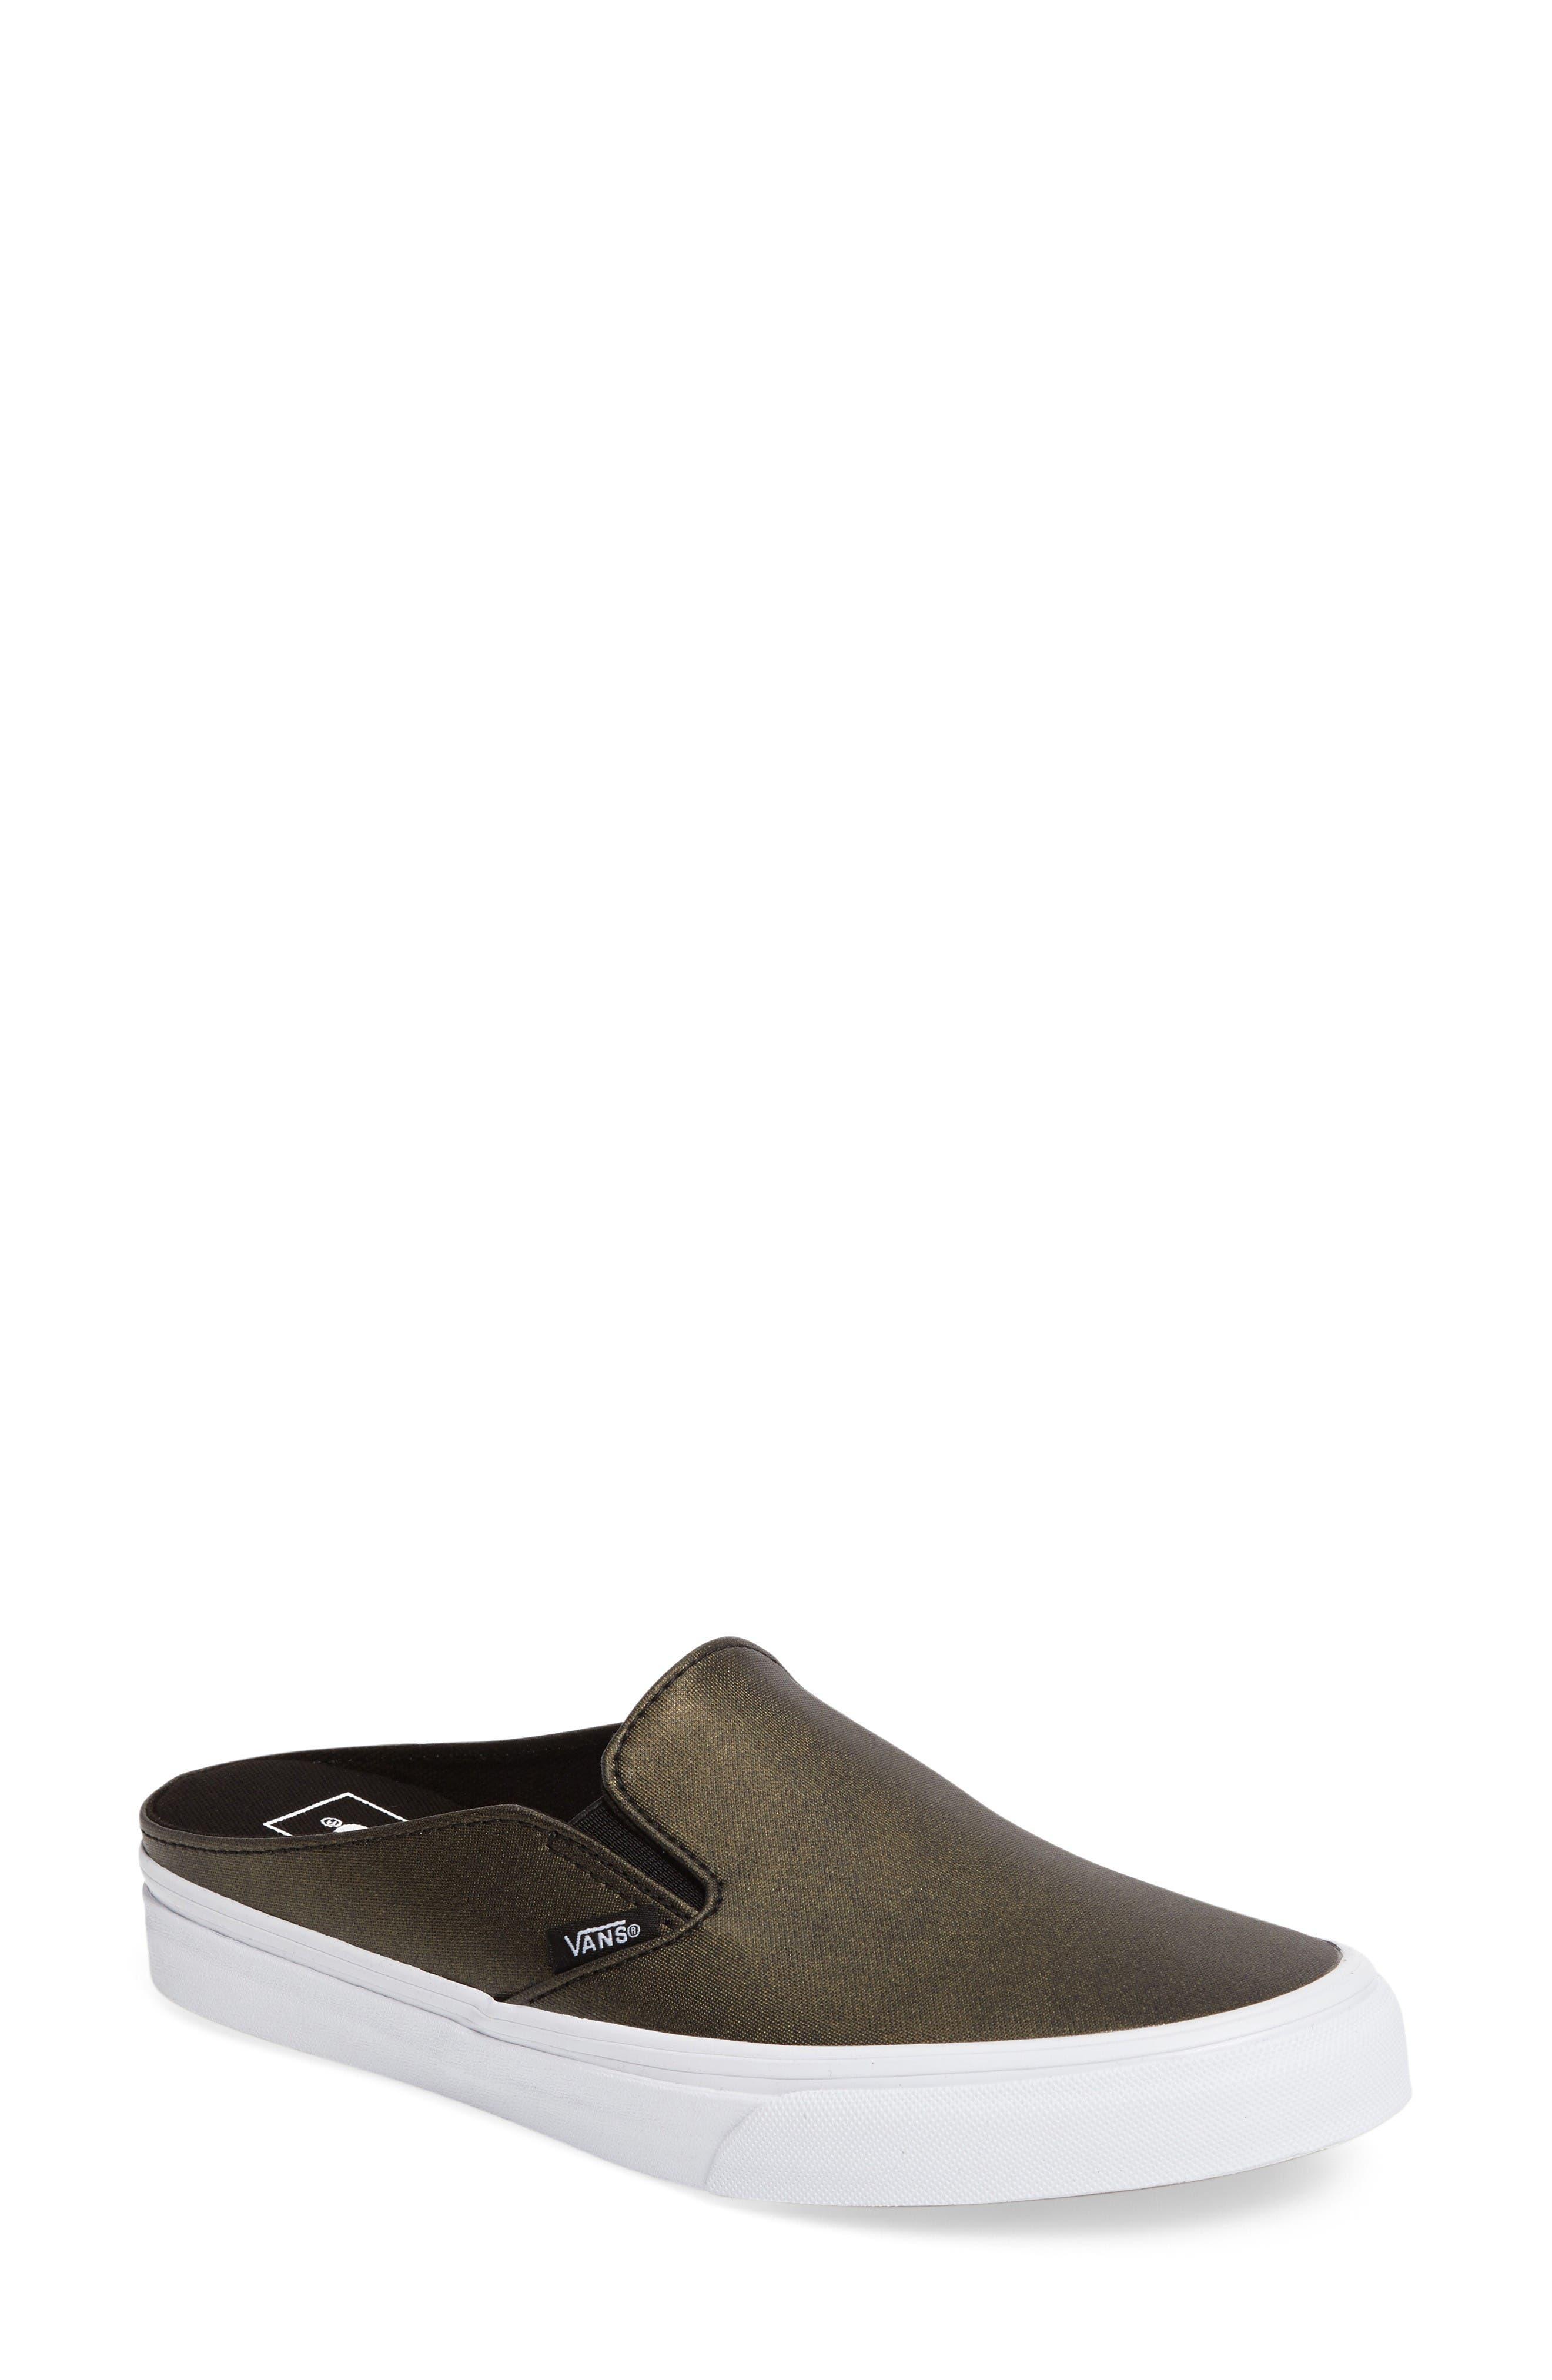 Main Image - Vans 'Classic' Slip-On Sneaker Mule (Women)